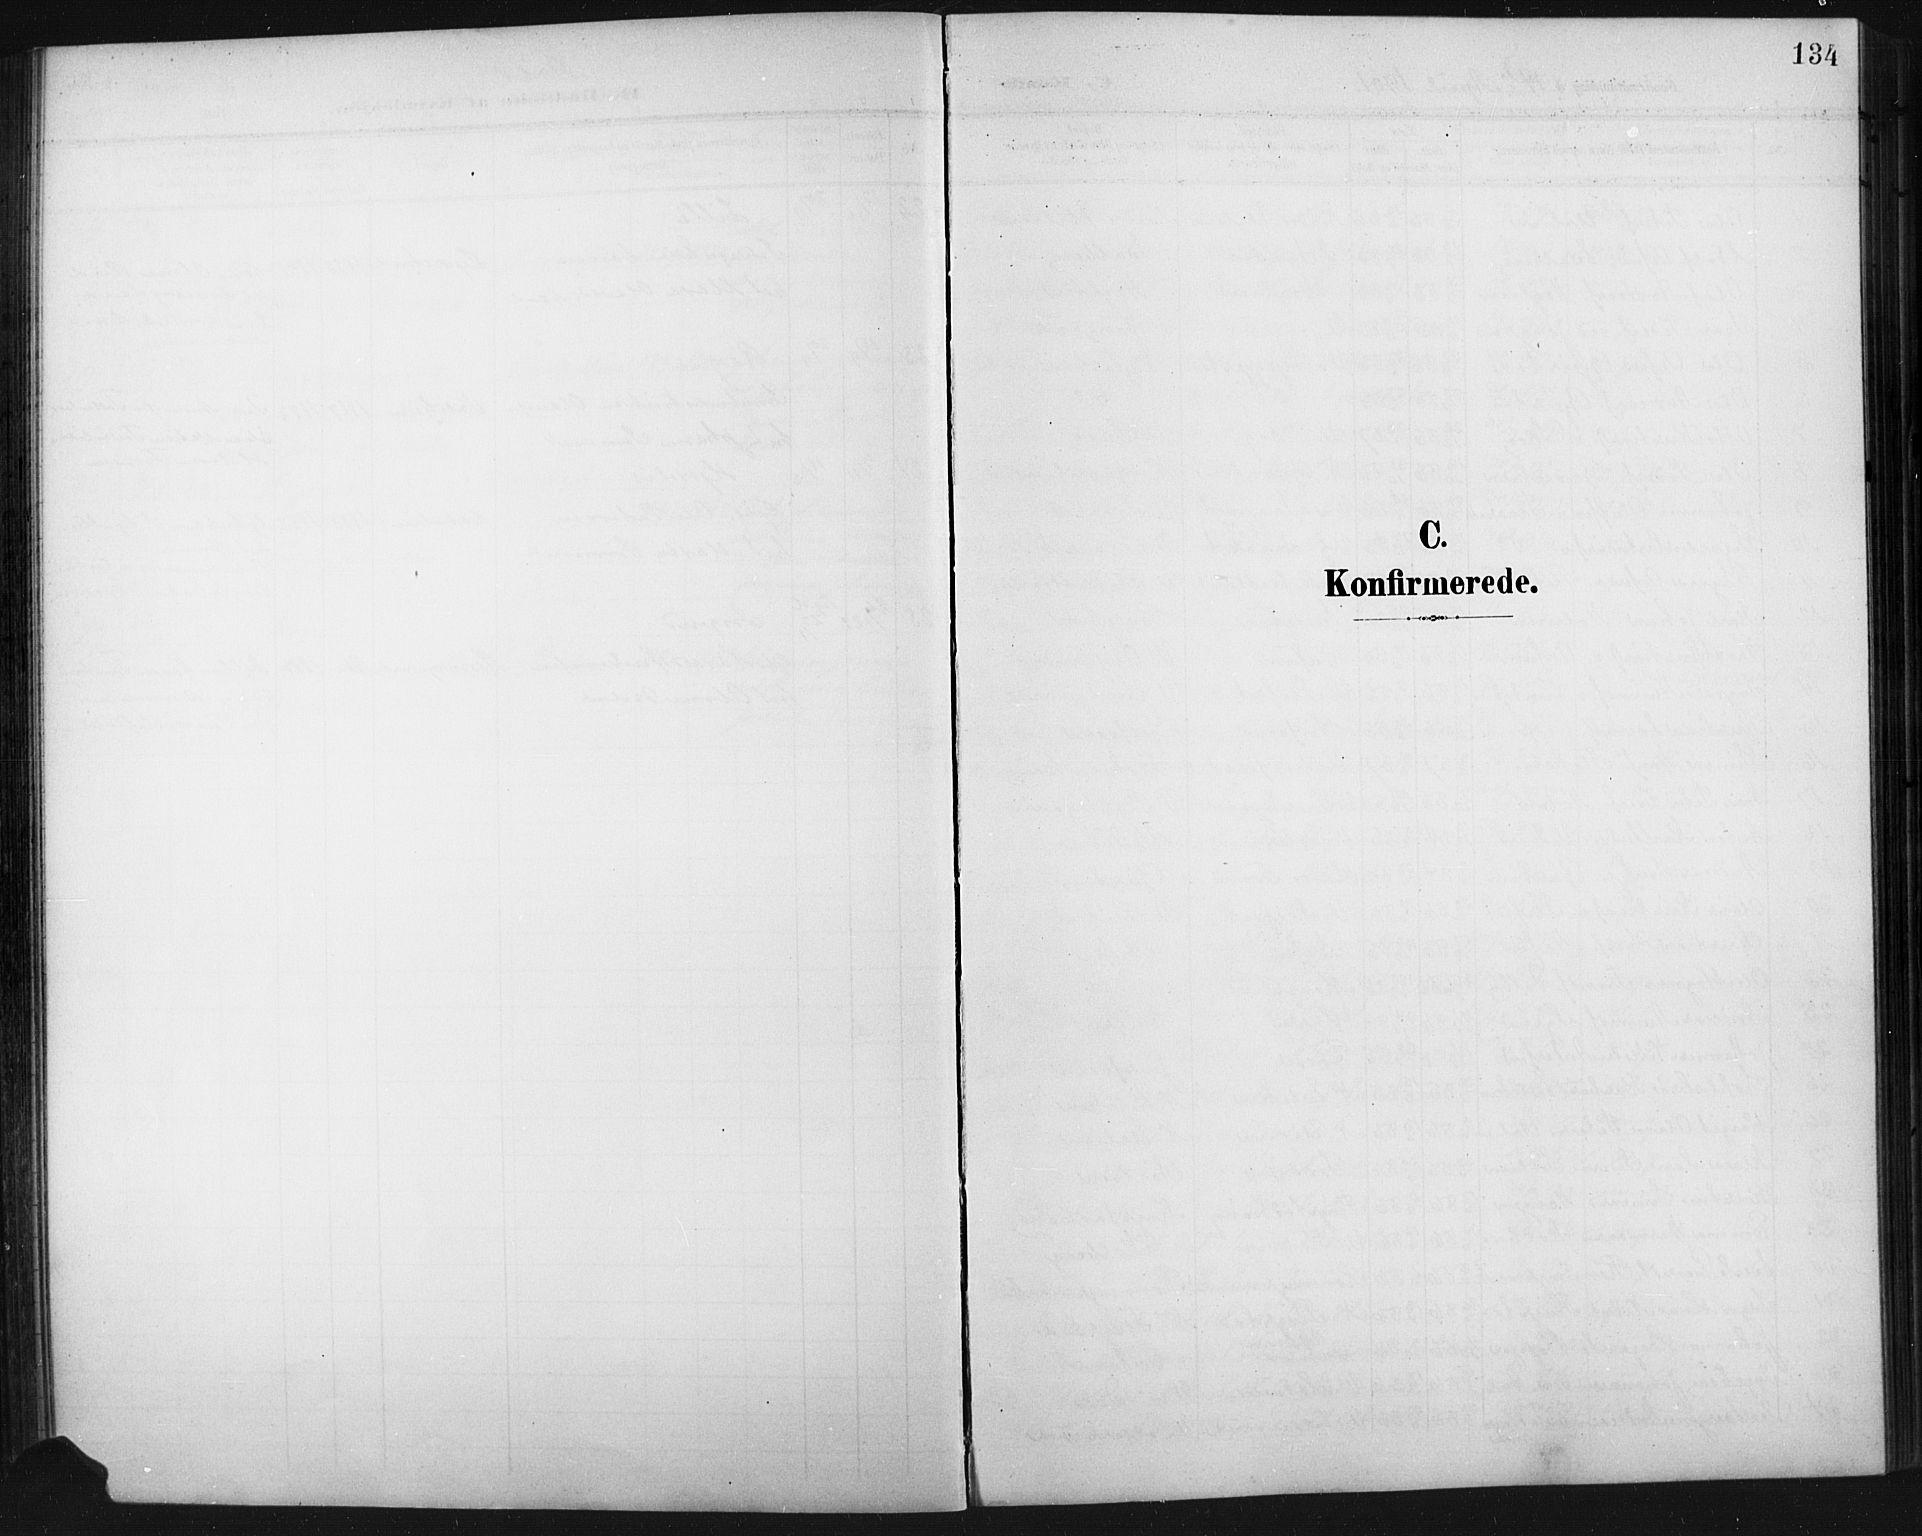 SAH, Fåberg prestekontor, Klokkerbok nr. 11, 1901-1921, s. 134